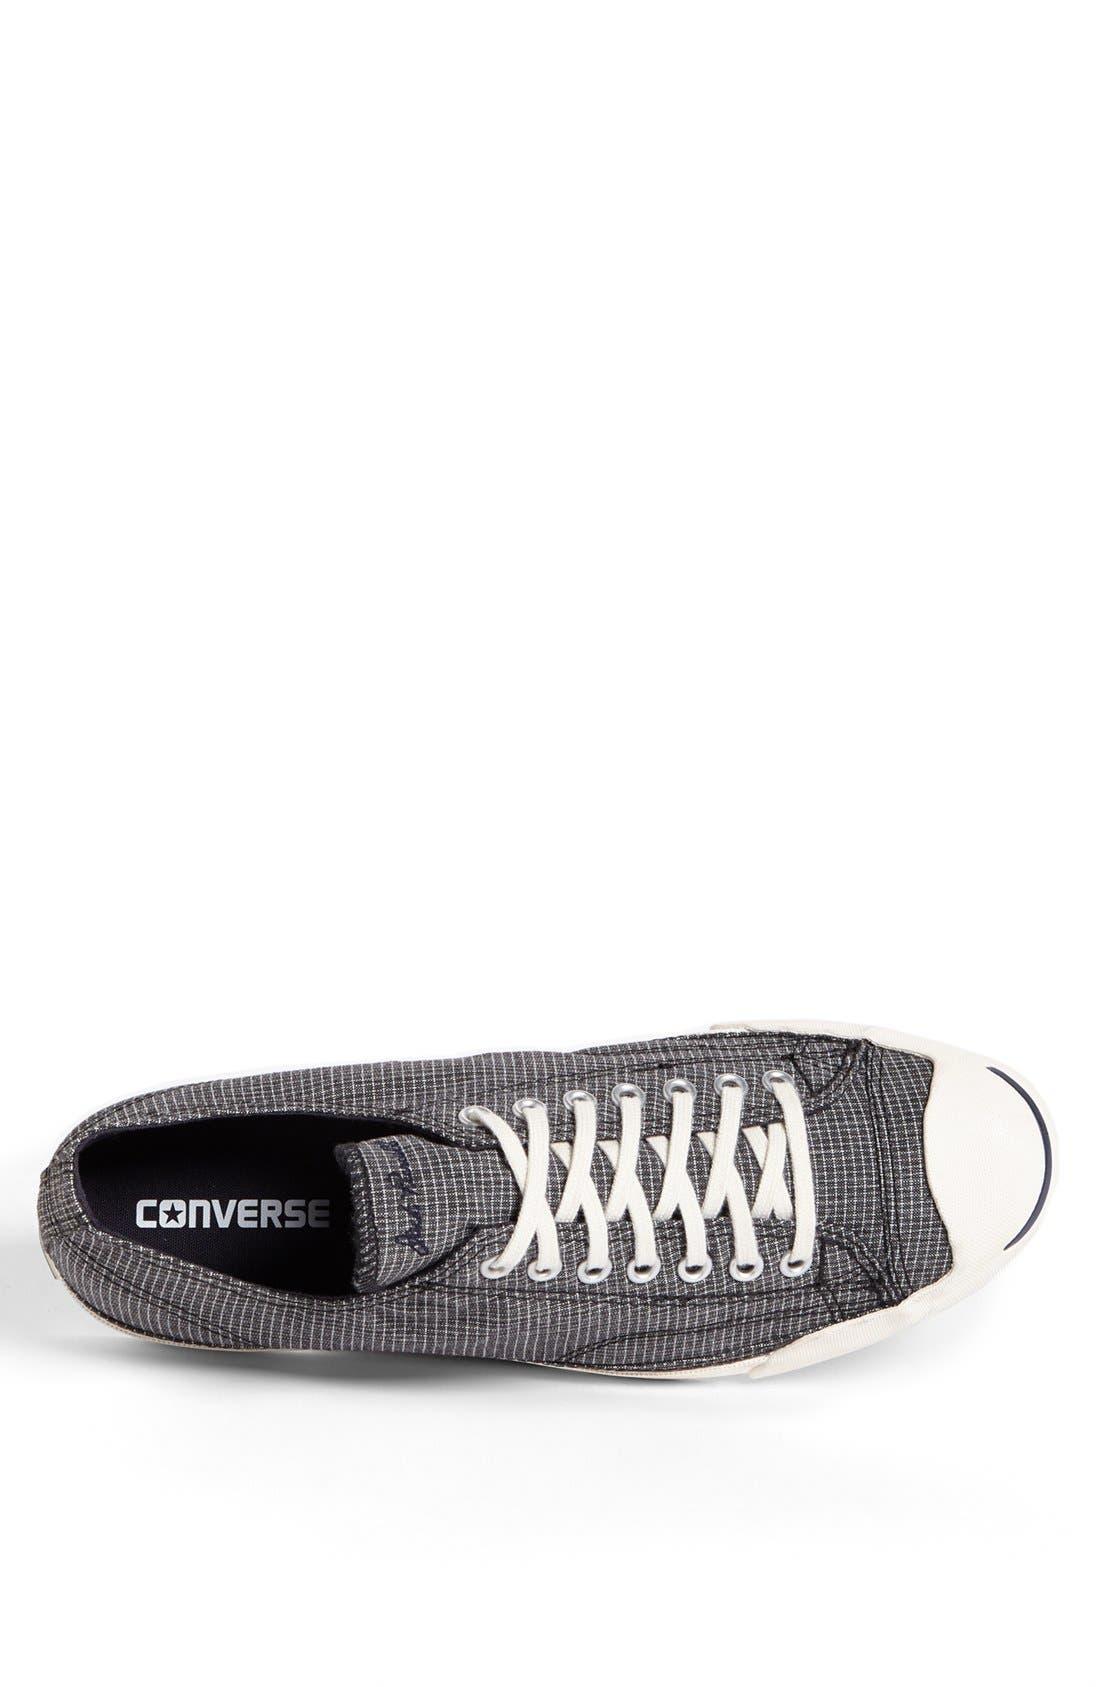 Alternate Image 3  - Converse 'Jack Purcell LP' Sneaker (Men)